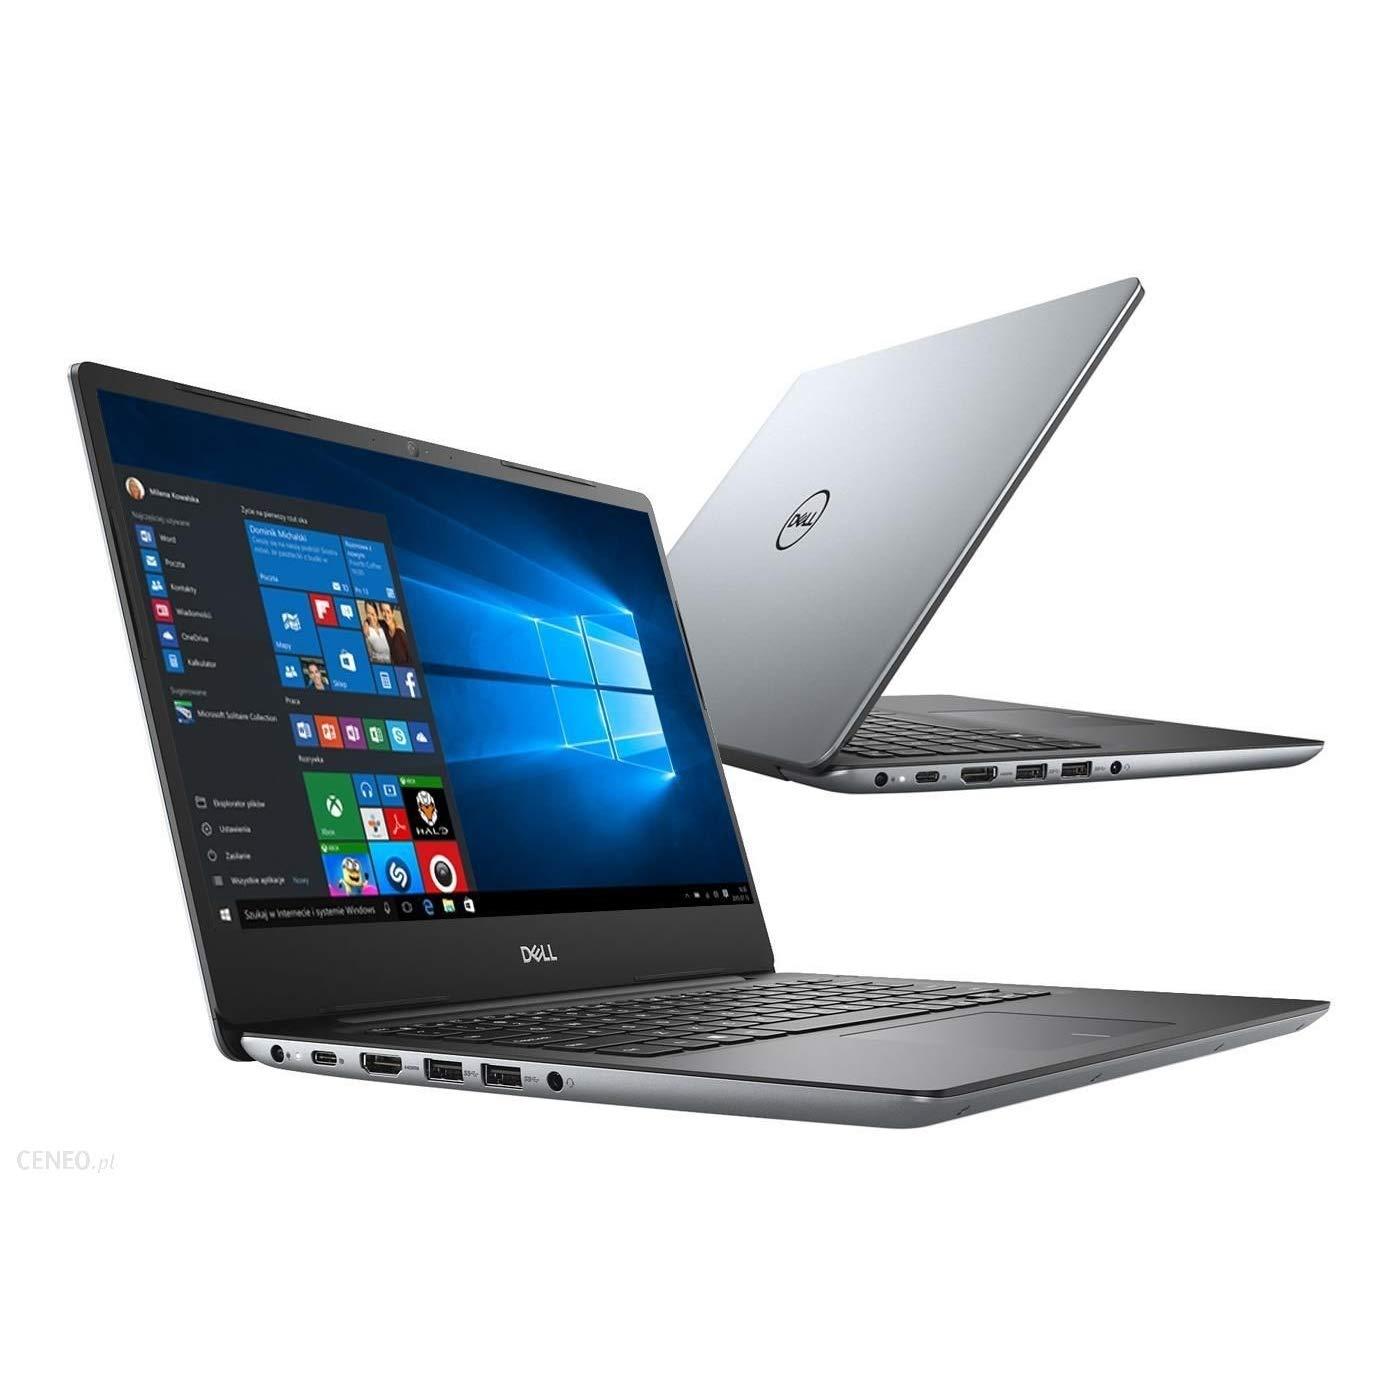 Dell Vostro 5481-V5481A (Urban Gray)   i5-8265U   4GB DDR4   HDD 1TB   VGA GeForce MX130 2GB   14.0 FHD IPS   Win10 + Office365 >>> Deal giá mua, Trả góp 0%